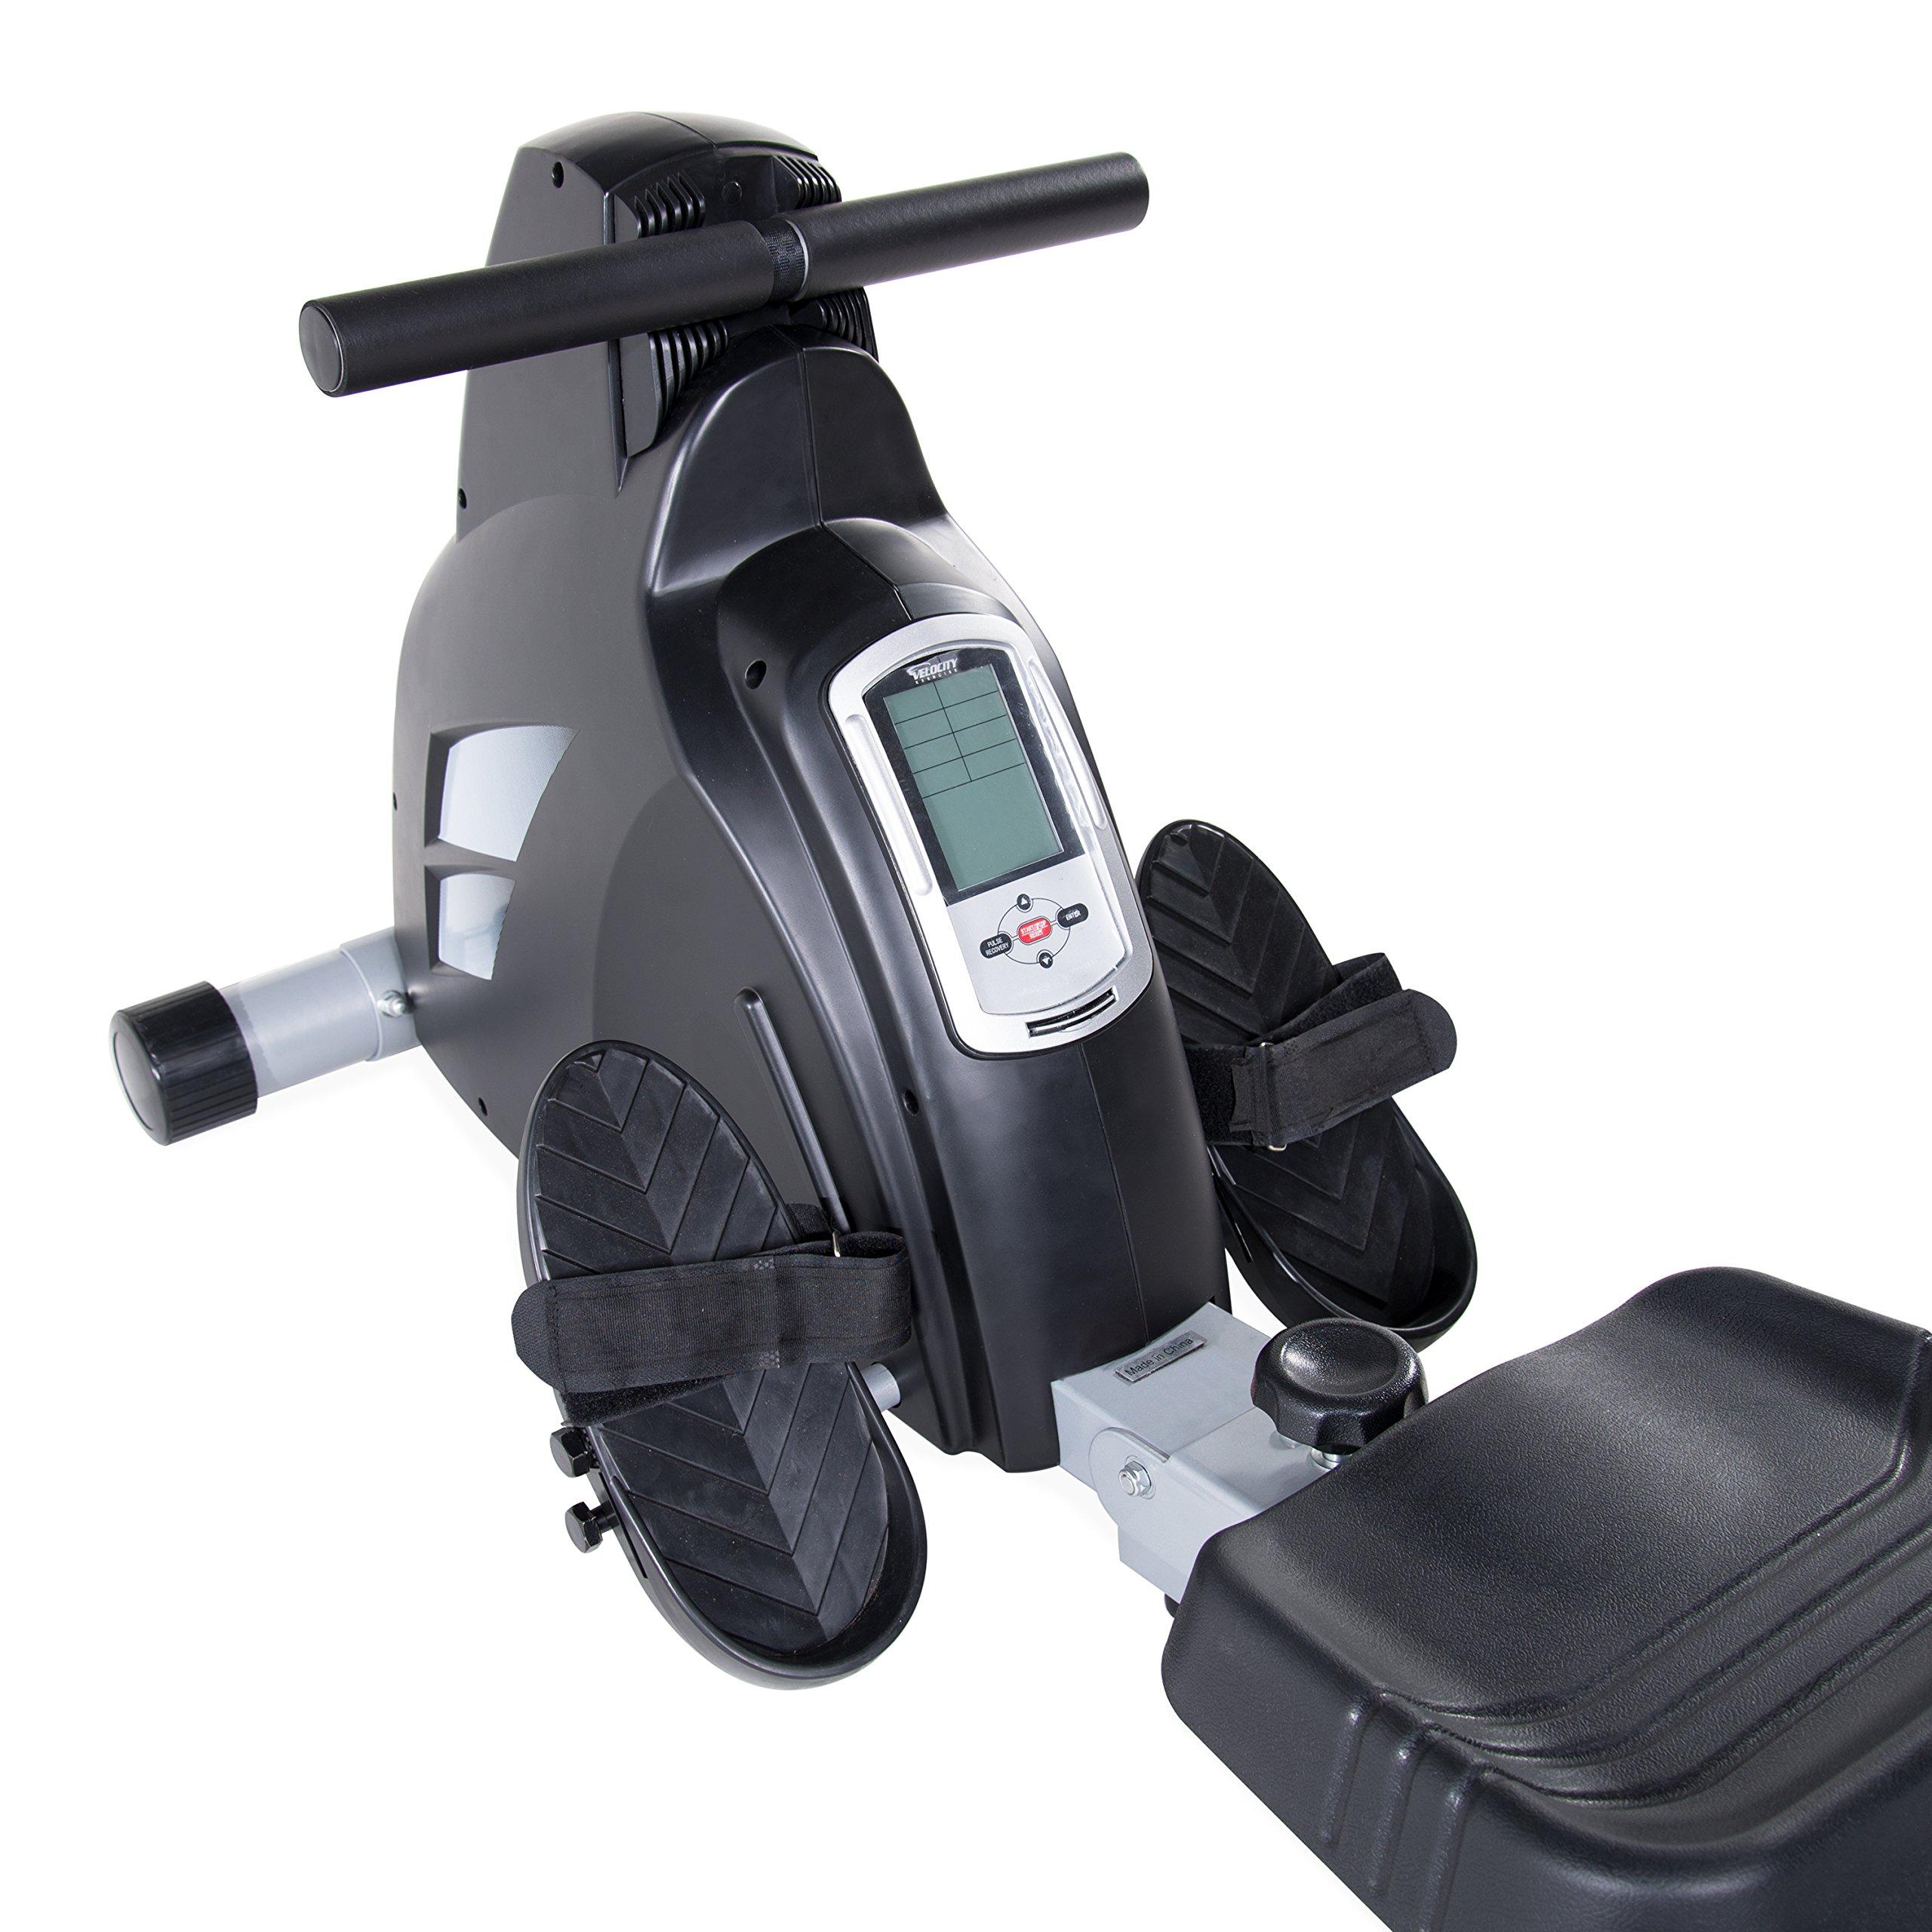 Velocity Exercise Magnetic Rower, Black by velocityexercise (Image #2)